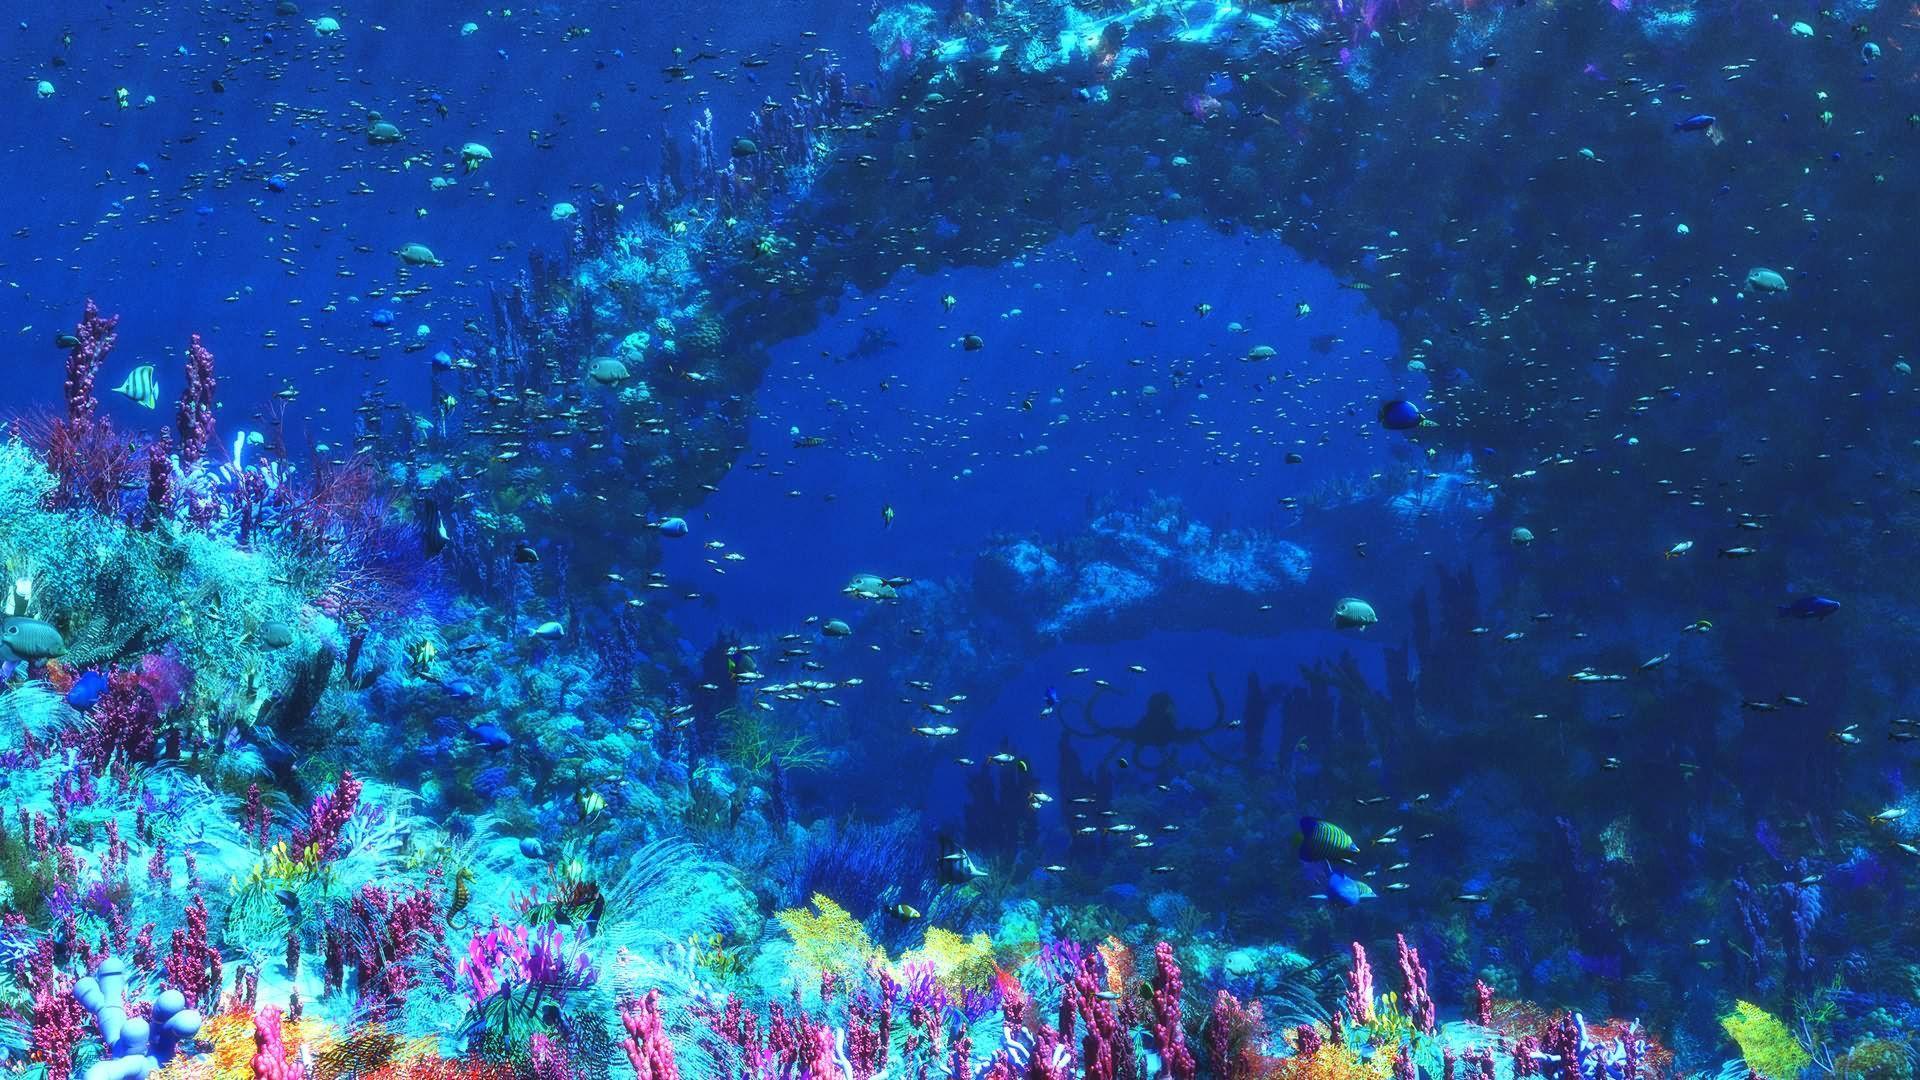 under water wallpapers wallpaper 1920a—1080 underwater images wallpapers 44 wallpapers adorable